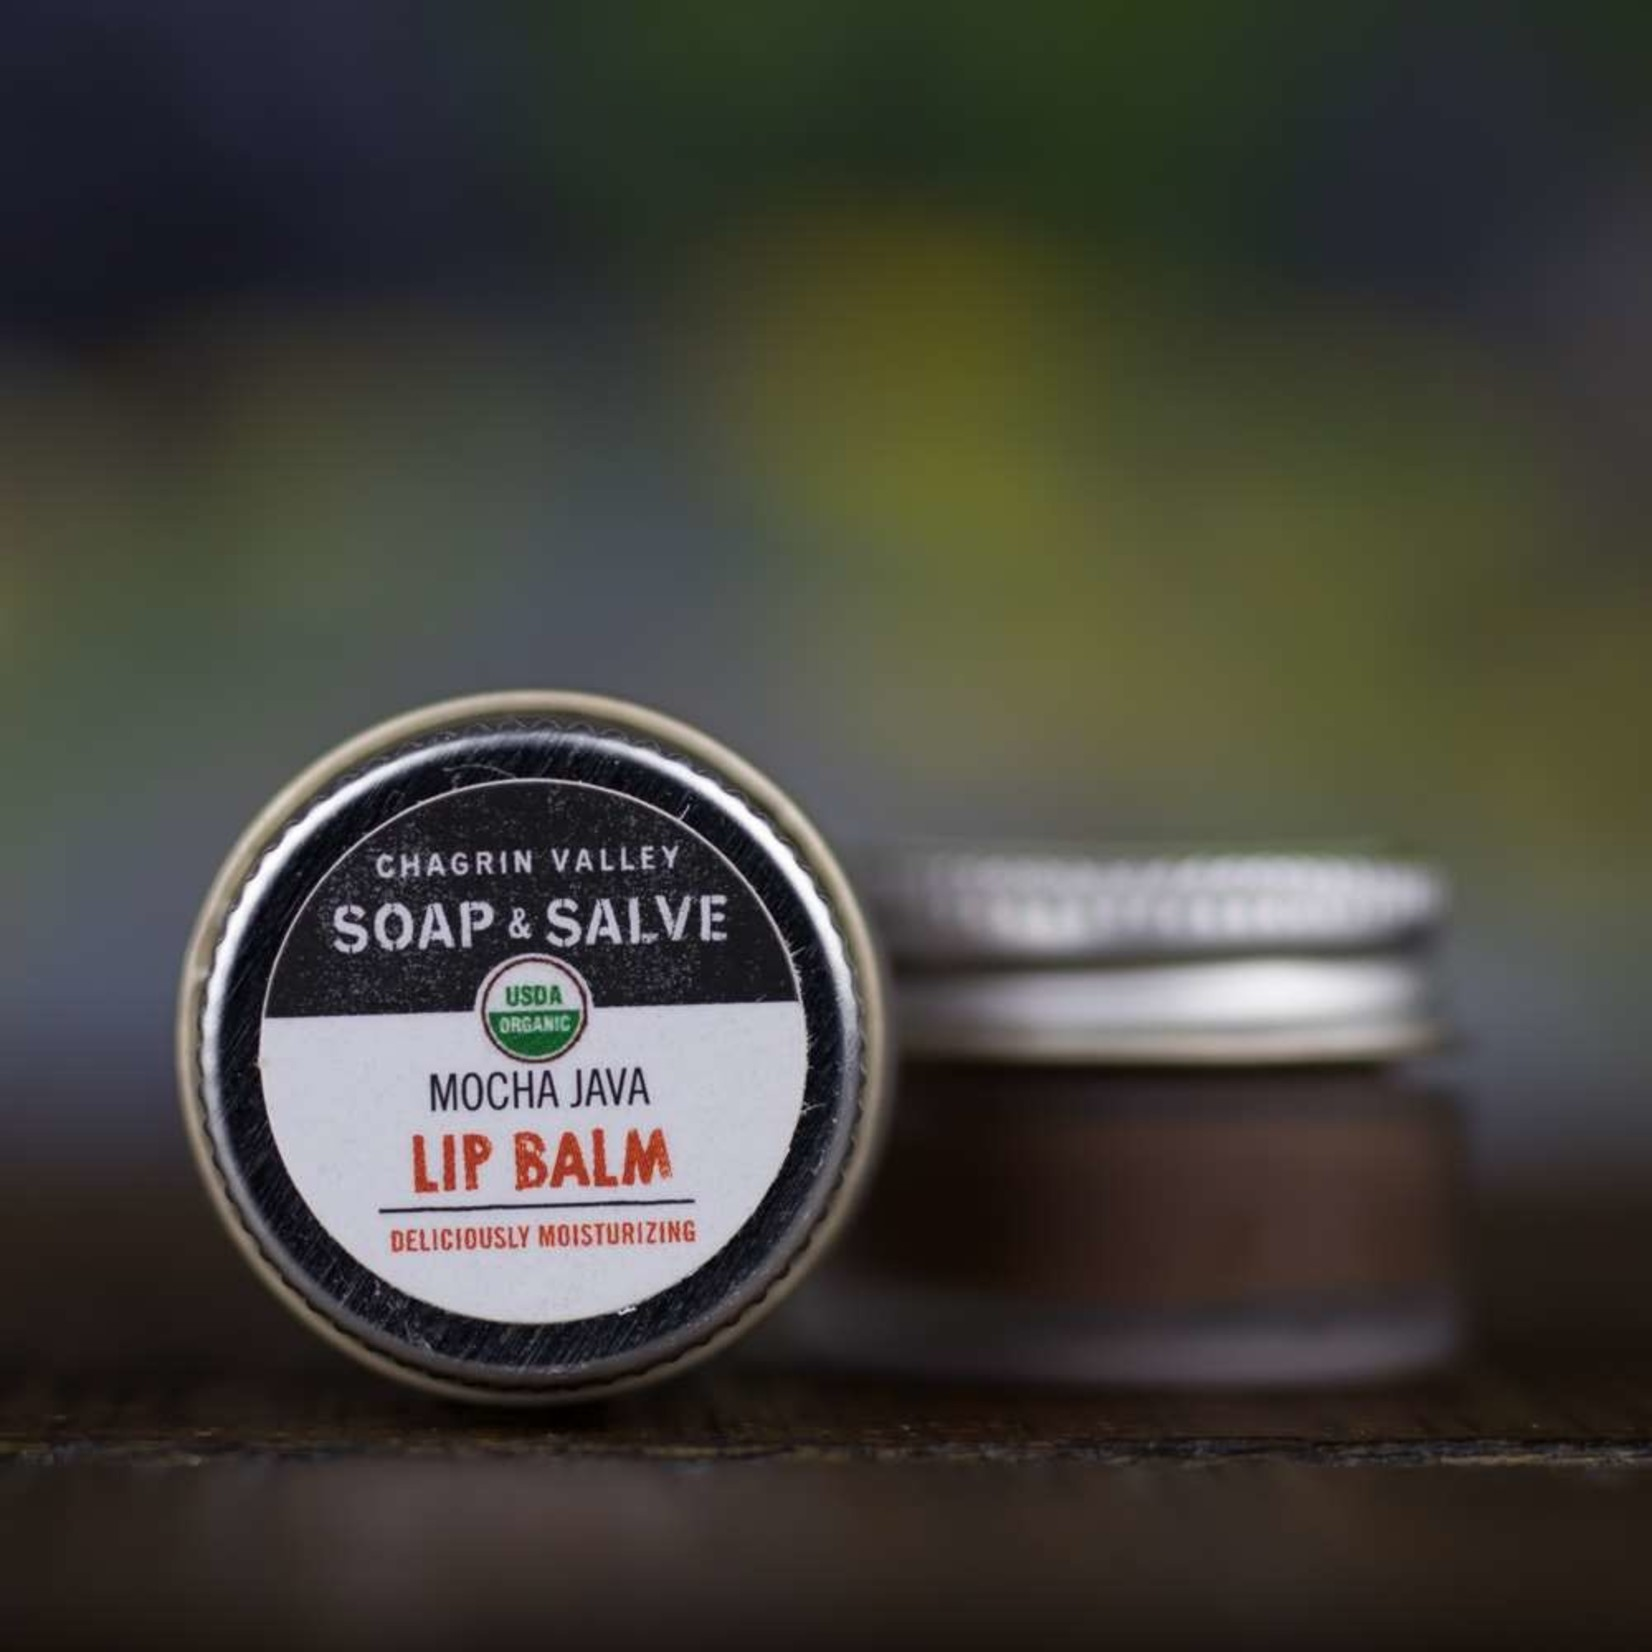 Chagrin Valley Soap and Salve Mocha Java Lip Balm .25oz Jar